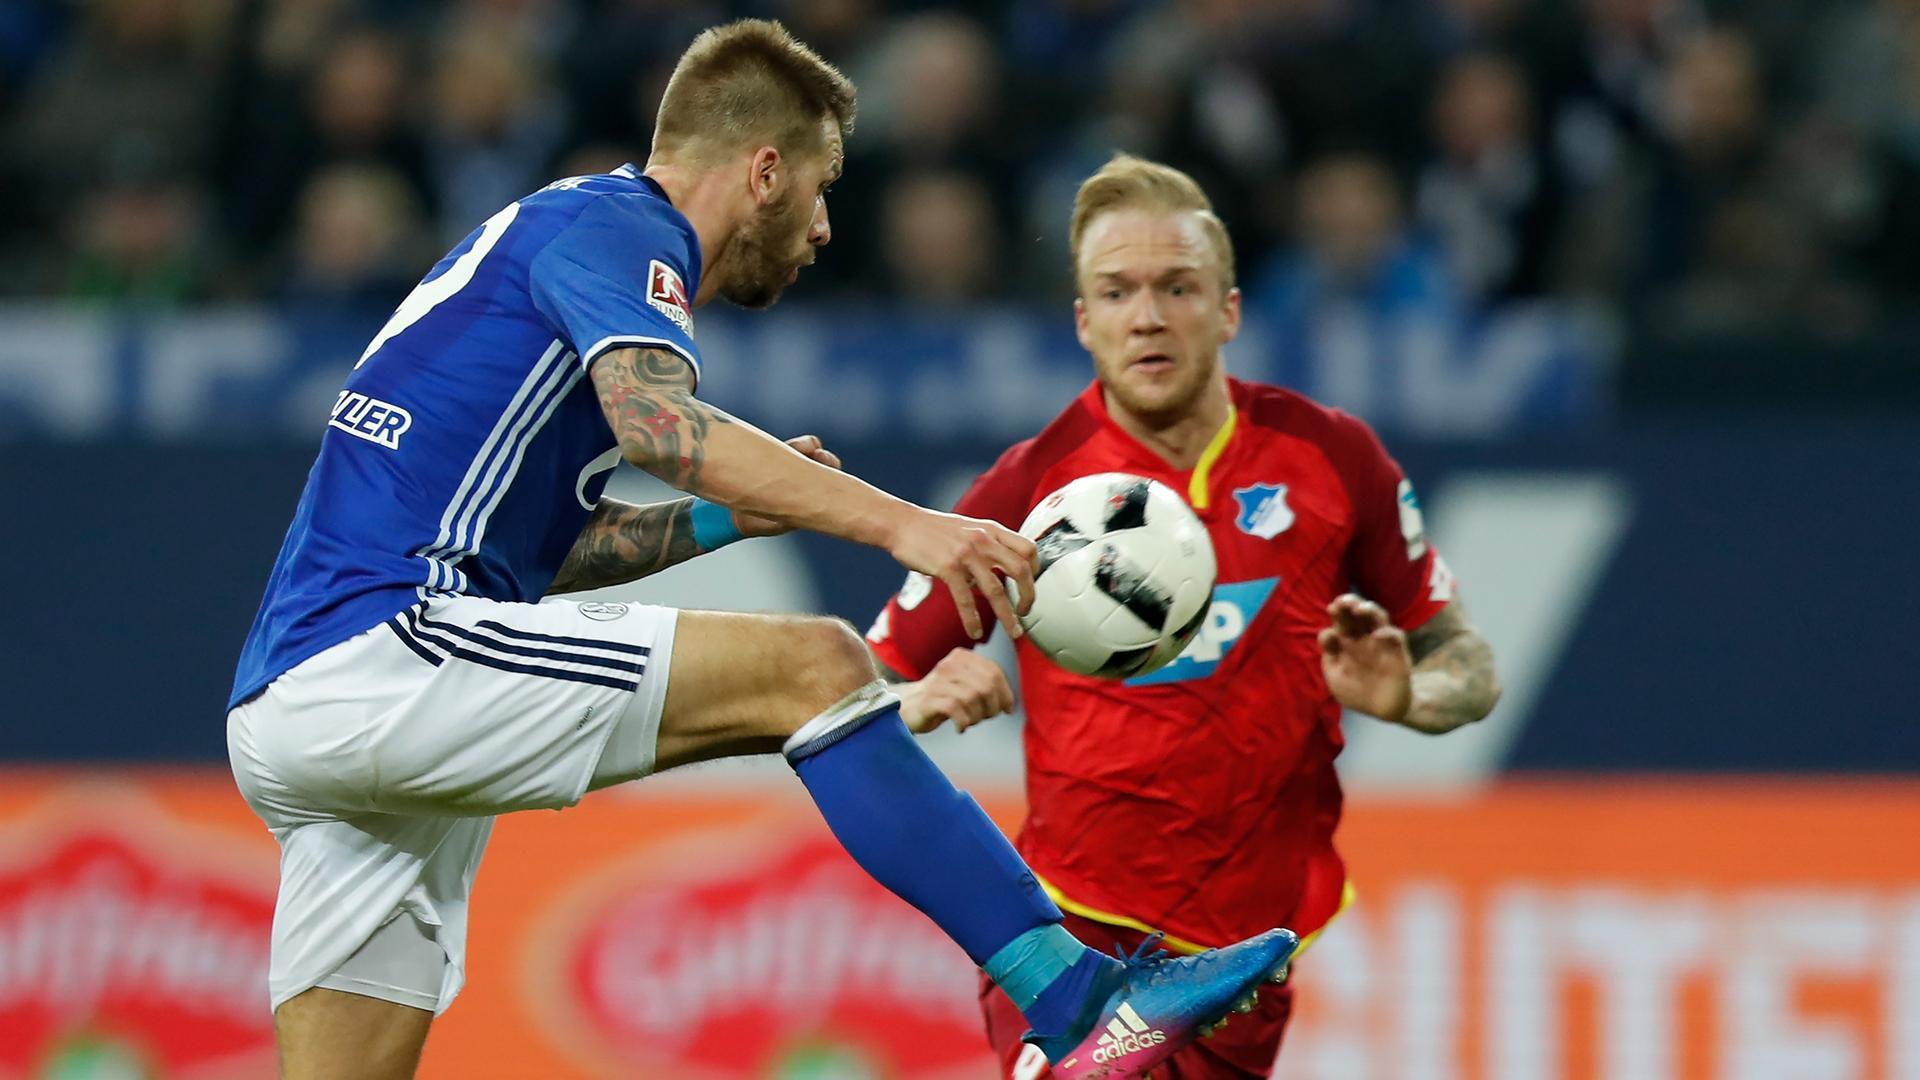 Fußball-Bundesliga: 22. Spieltag - ZDFmediathek